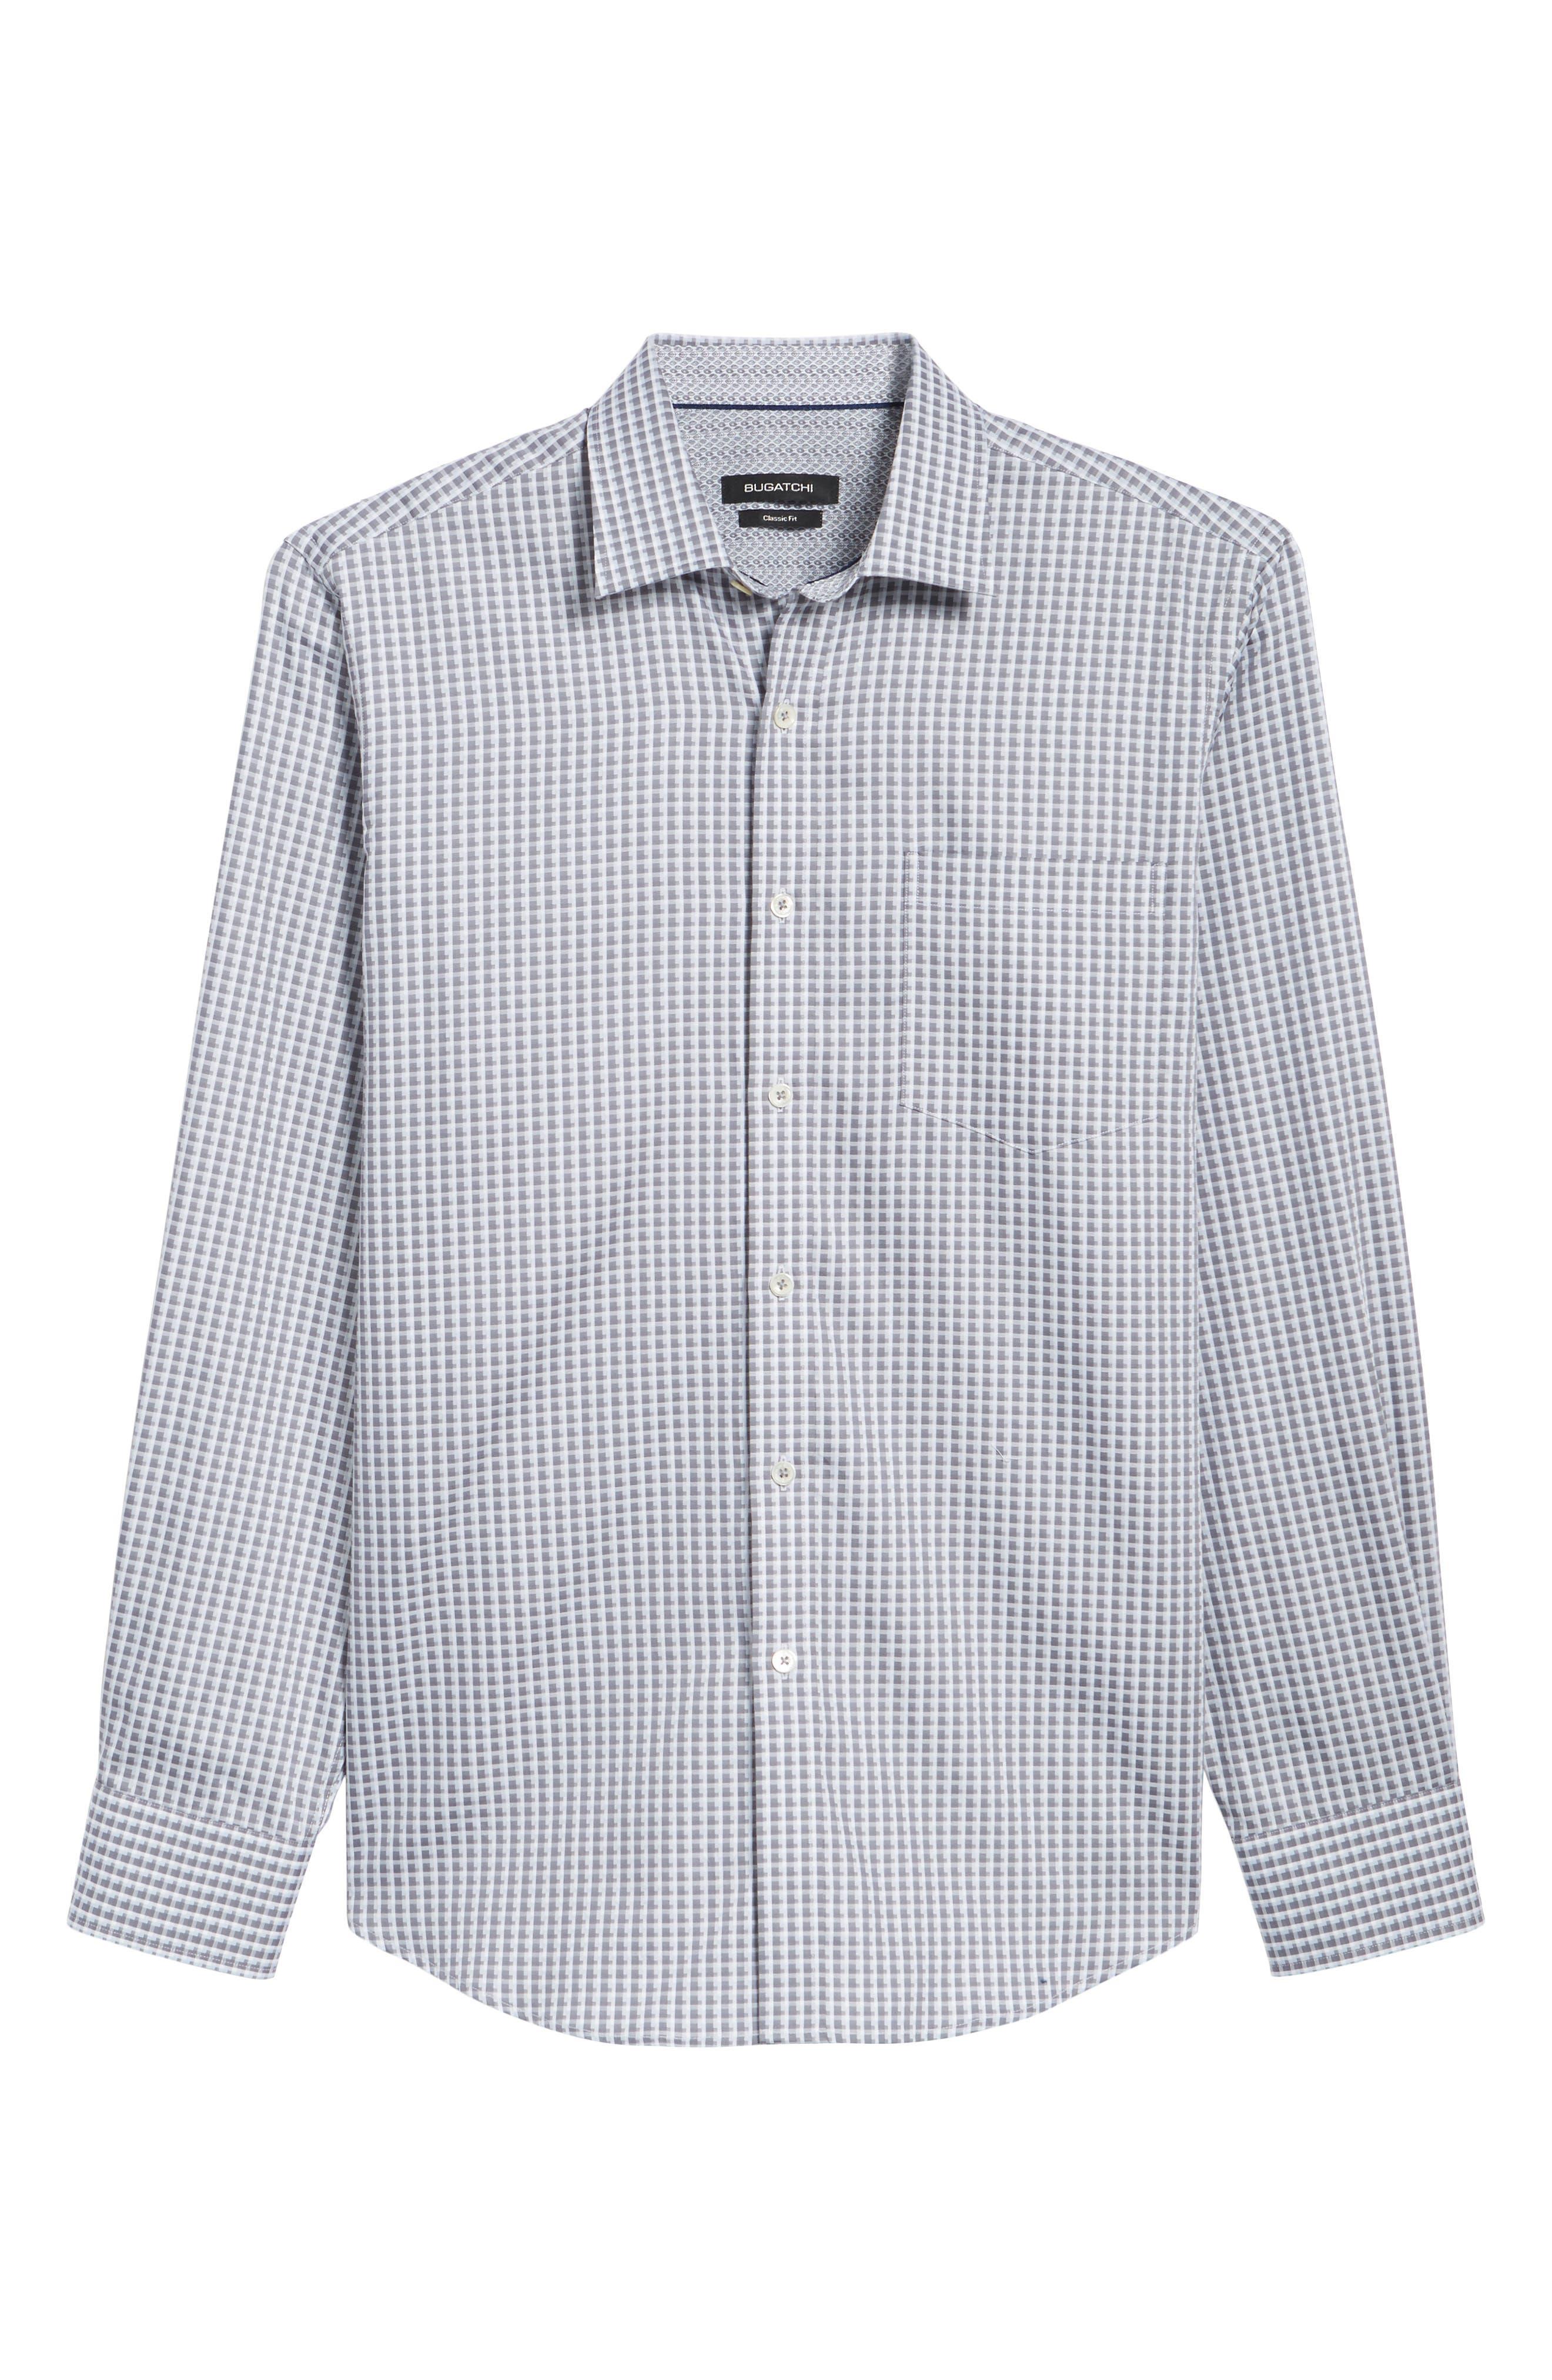 Regular Fit Check Sport Shirt,                             Alternate thumbnail 6, color,                             Platinum